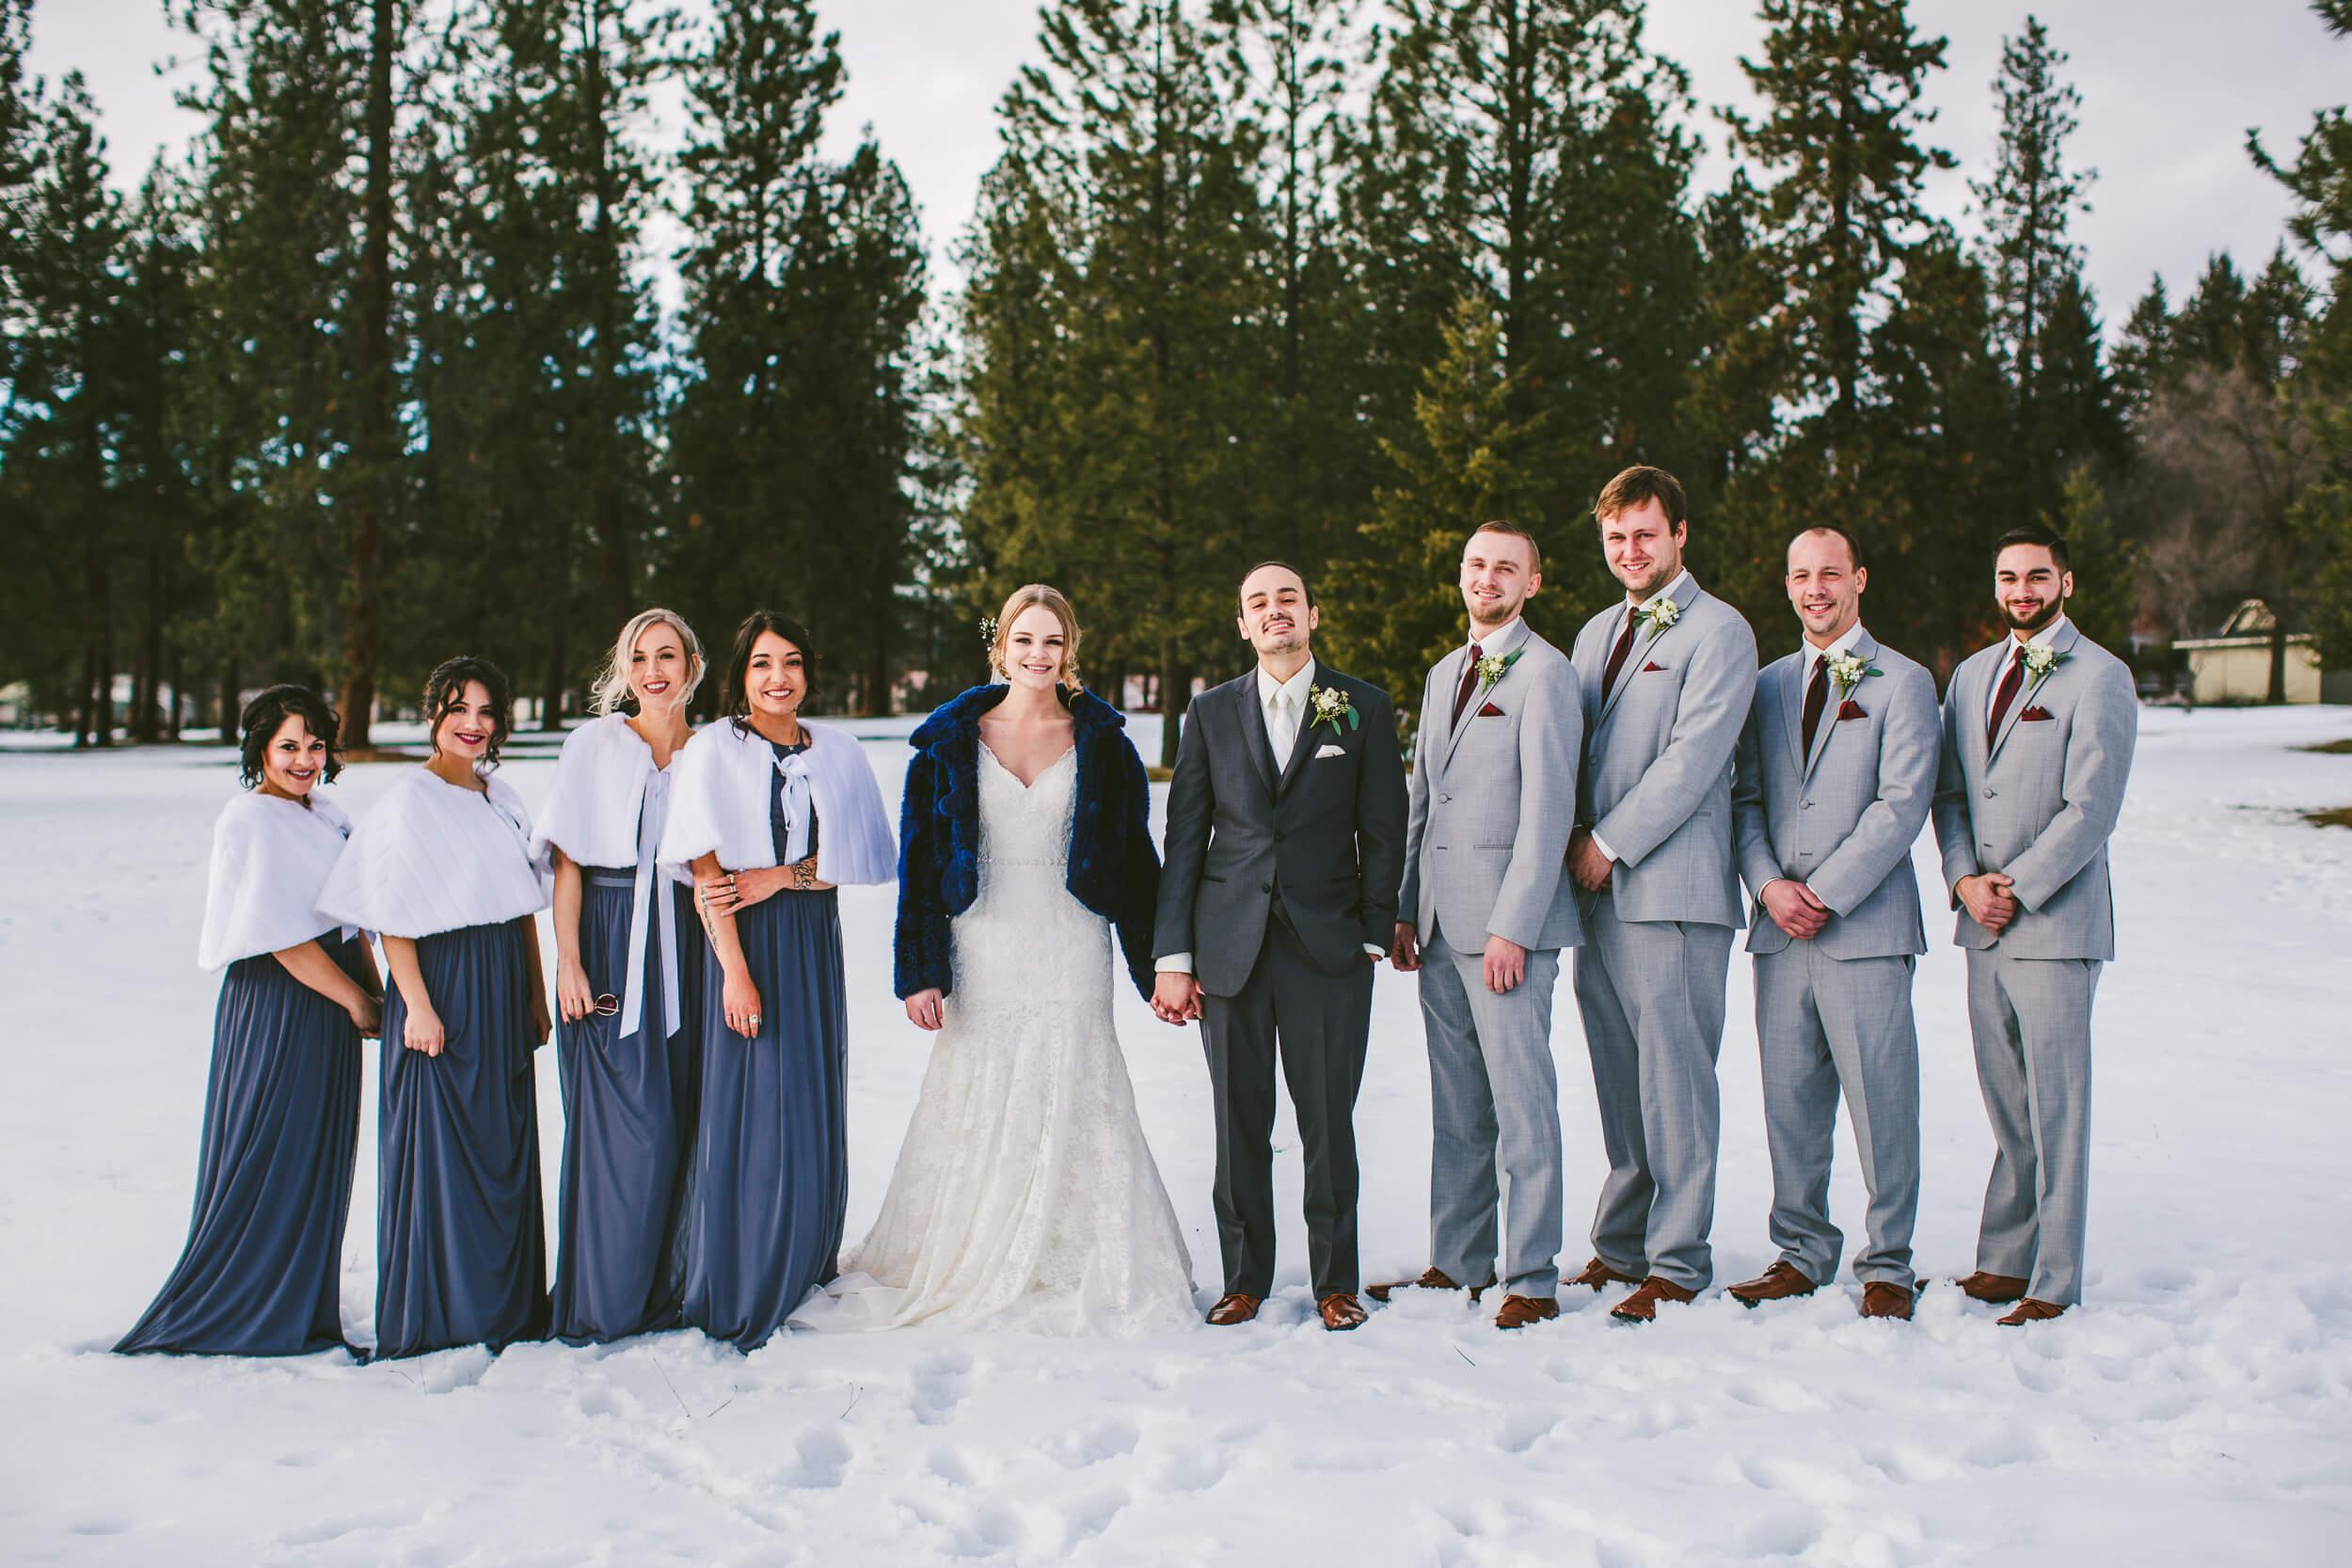 mukogawa winter wedding in spokane (97).jpg